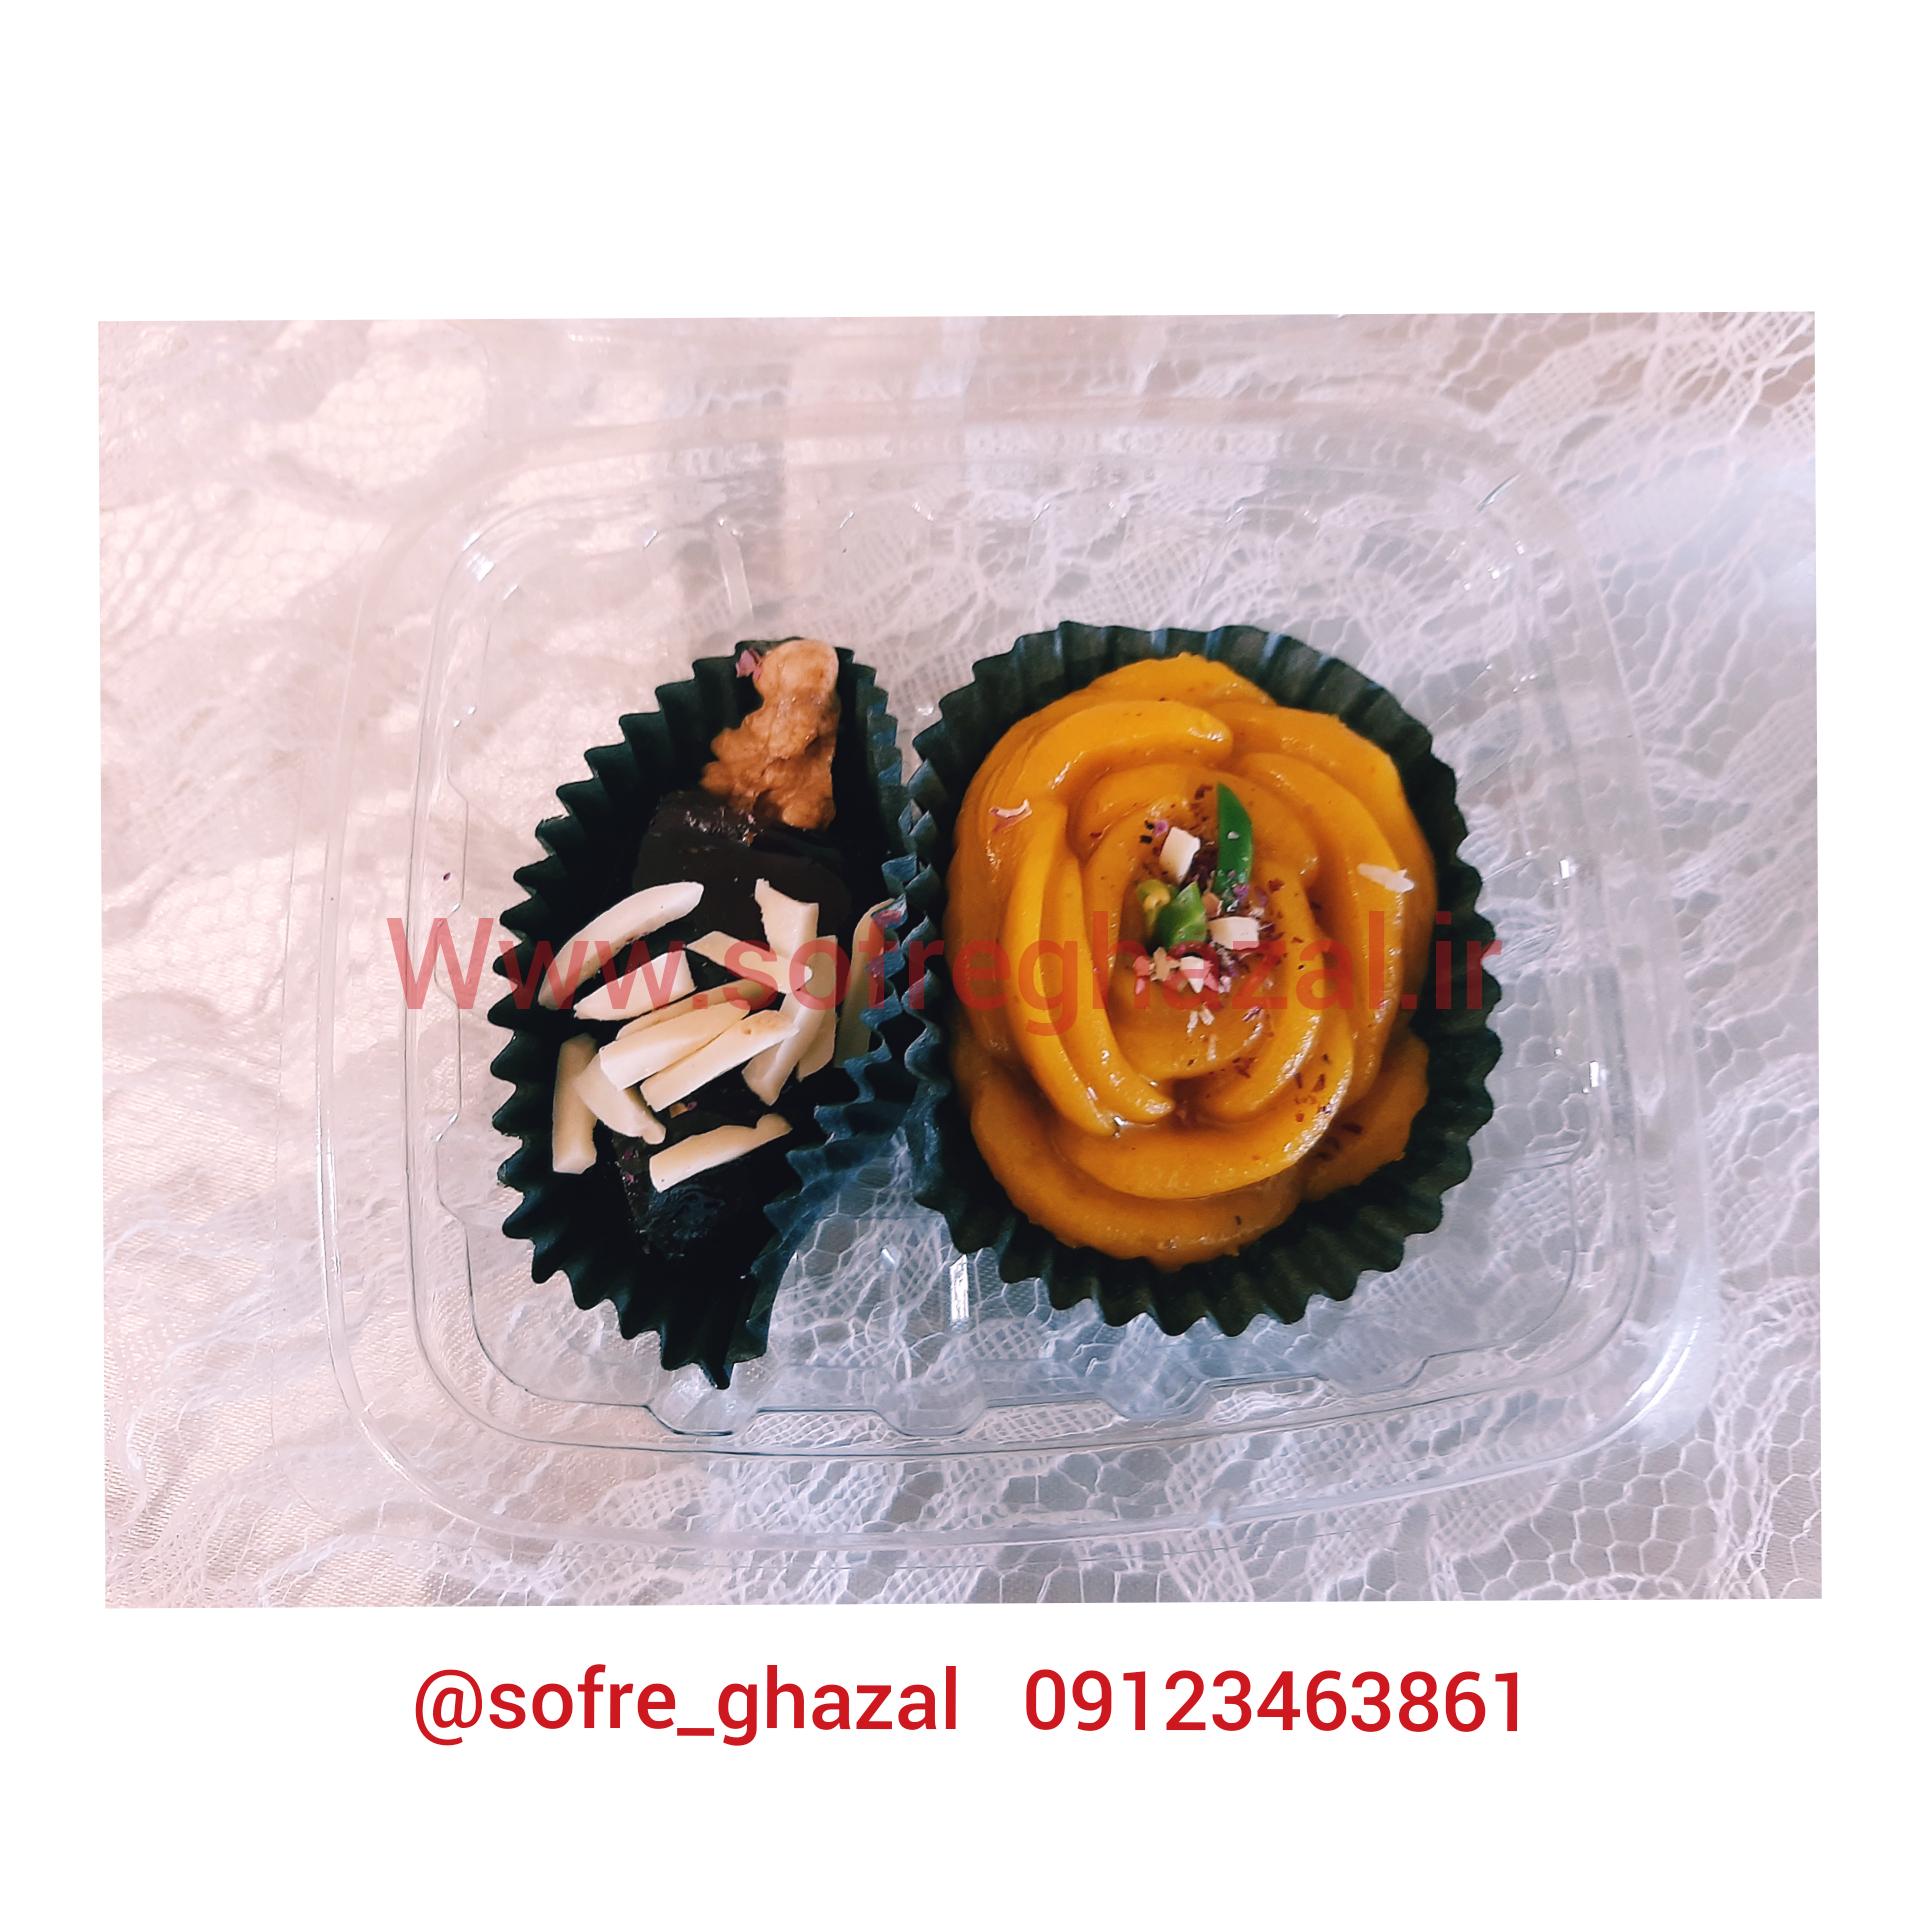 PhotoCollage_20210107_161256525